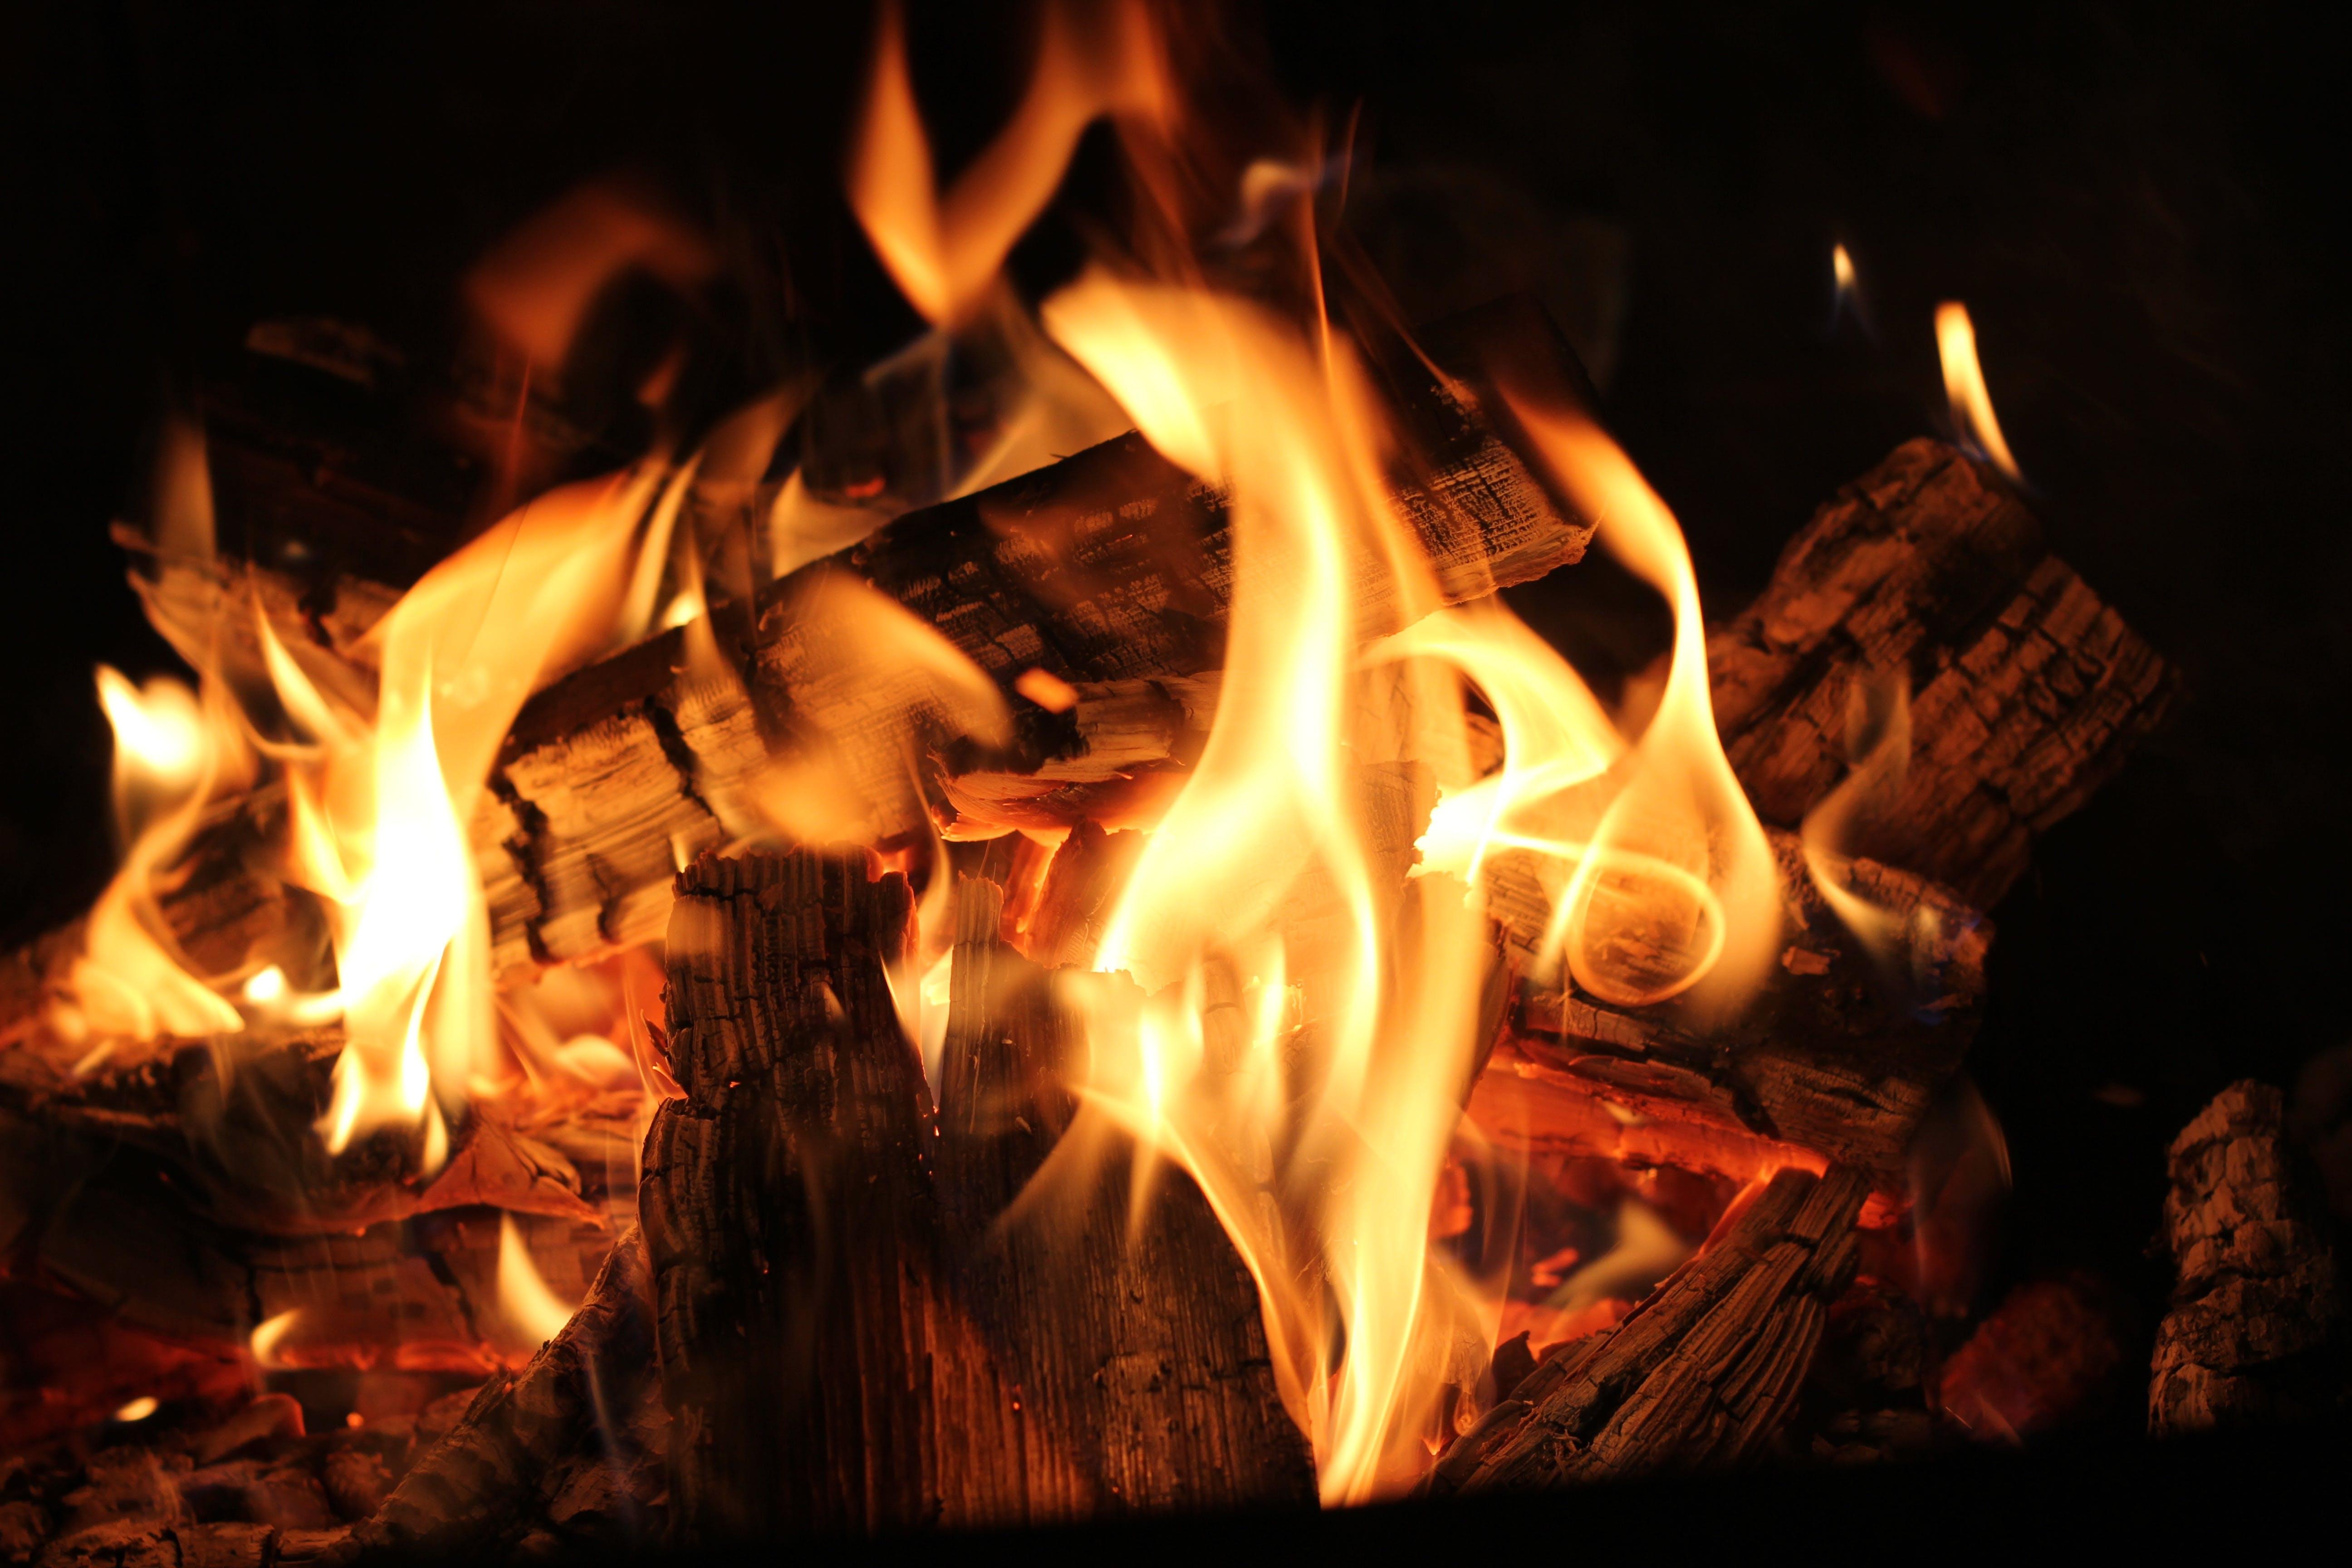 barbecue, blaze, bonfire